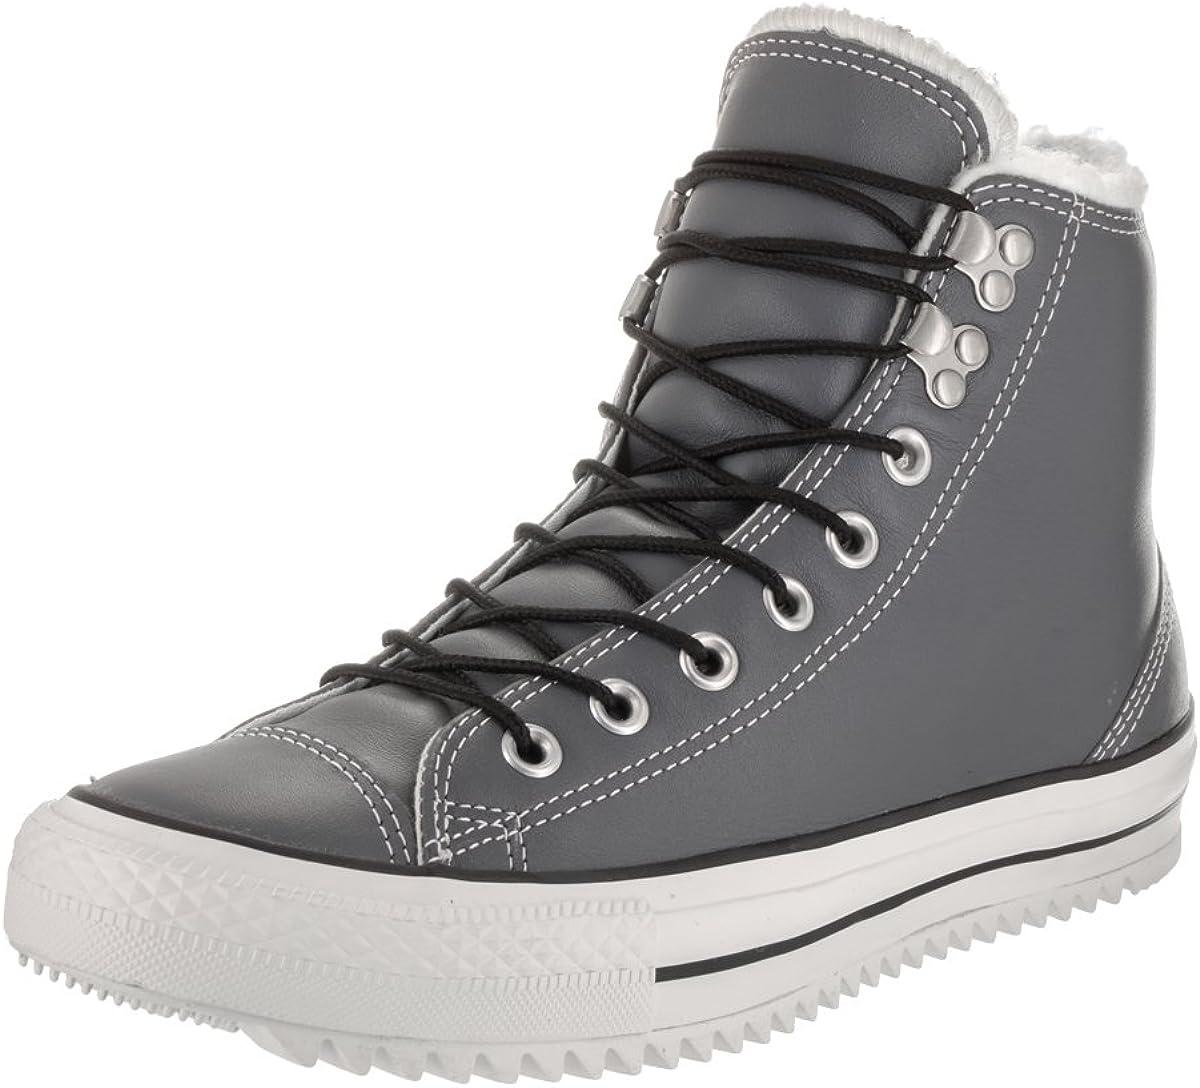 Converse CT City Hiker HI Hiking Shoes